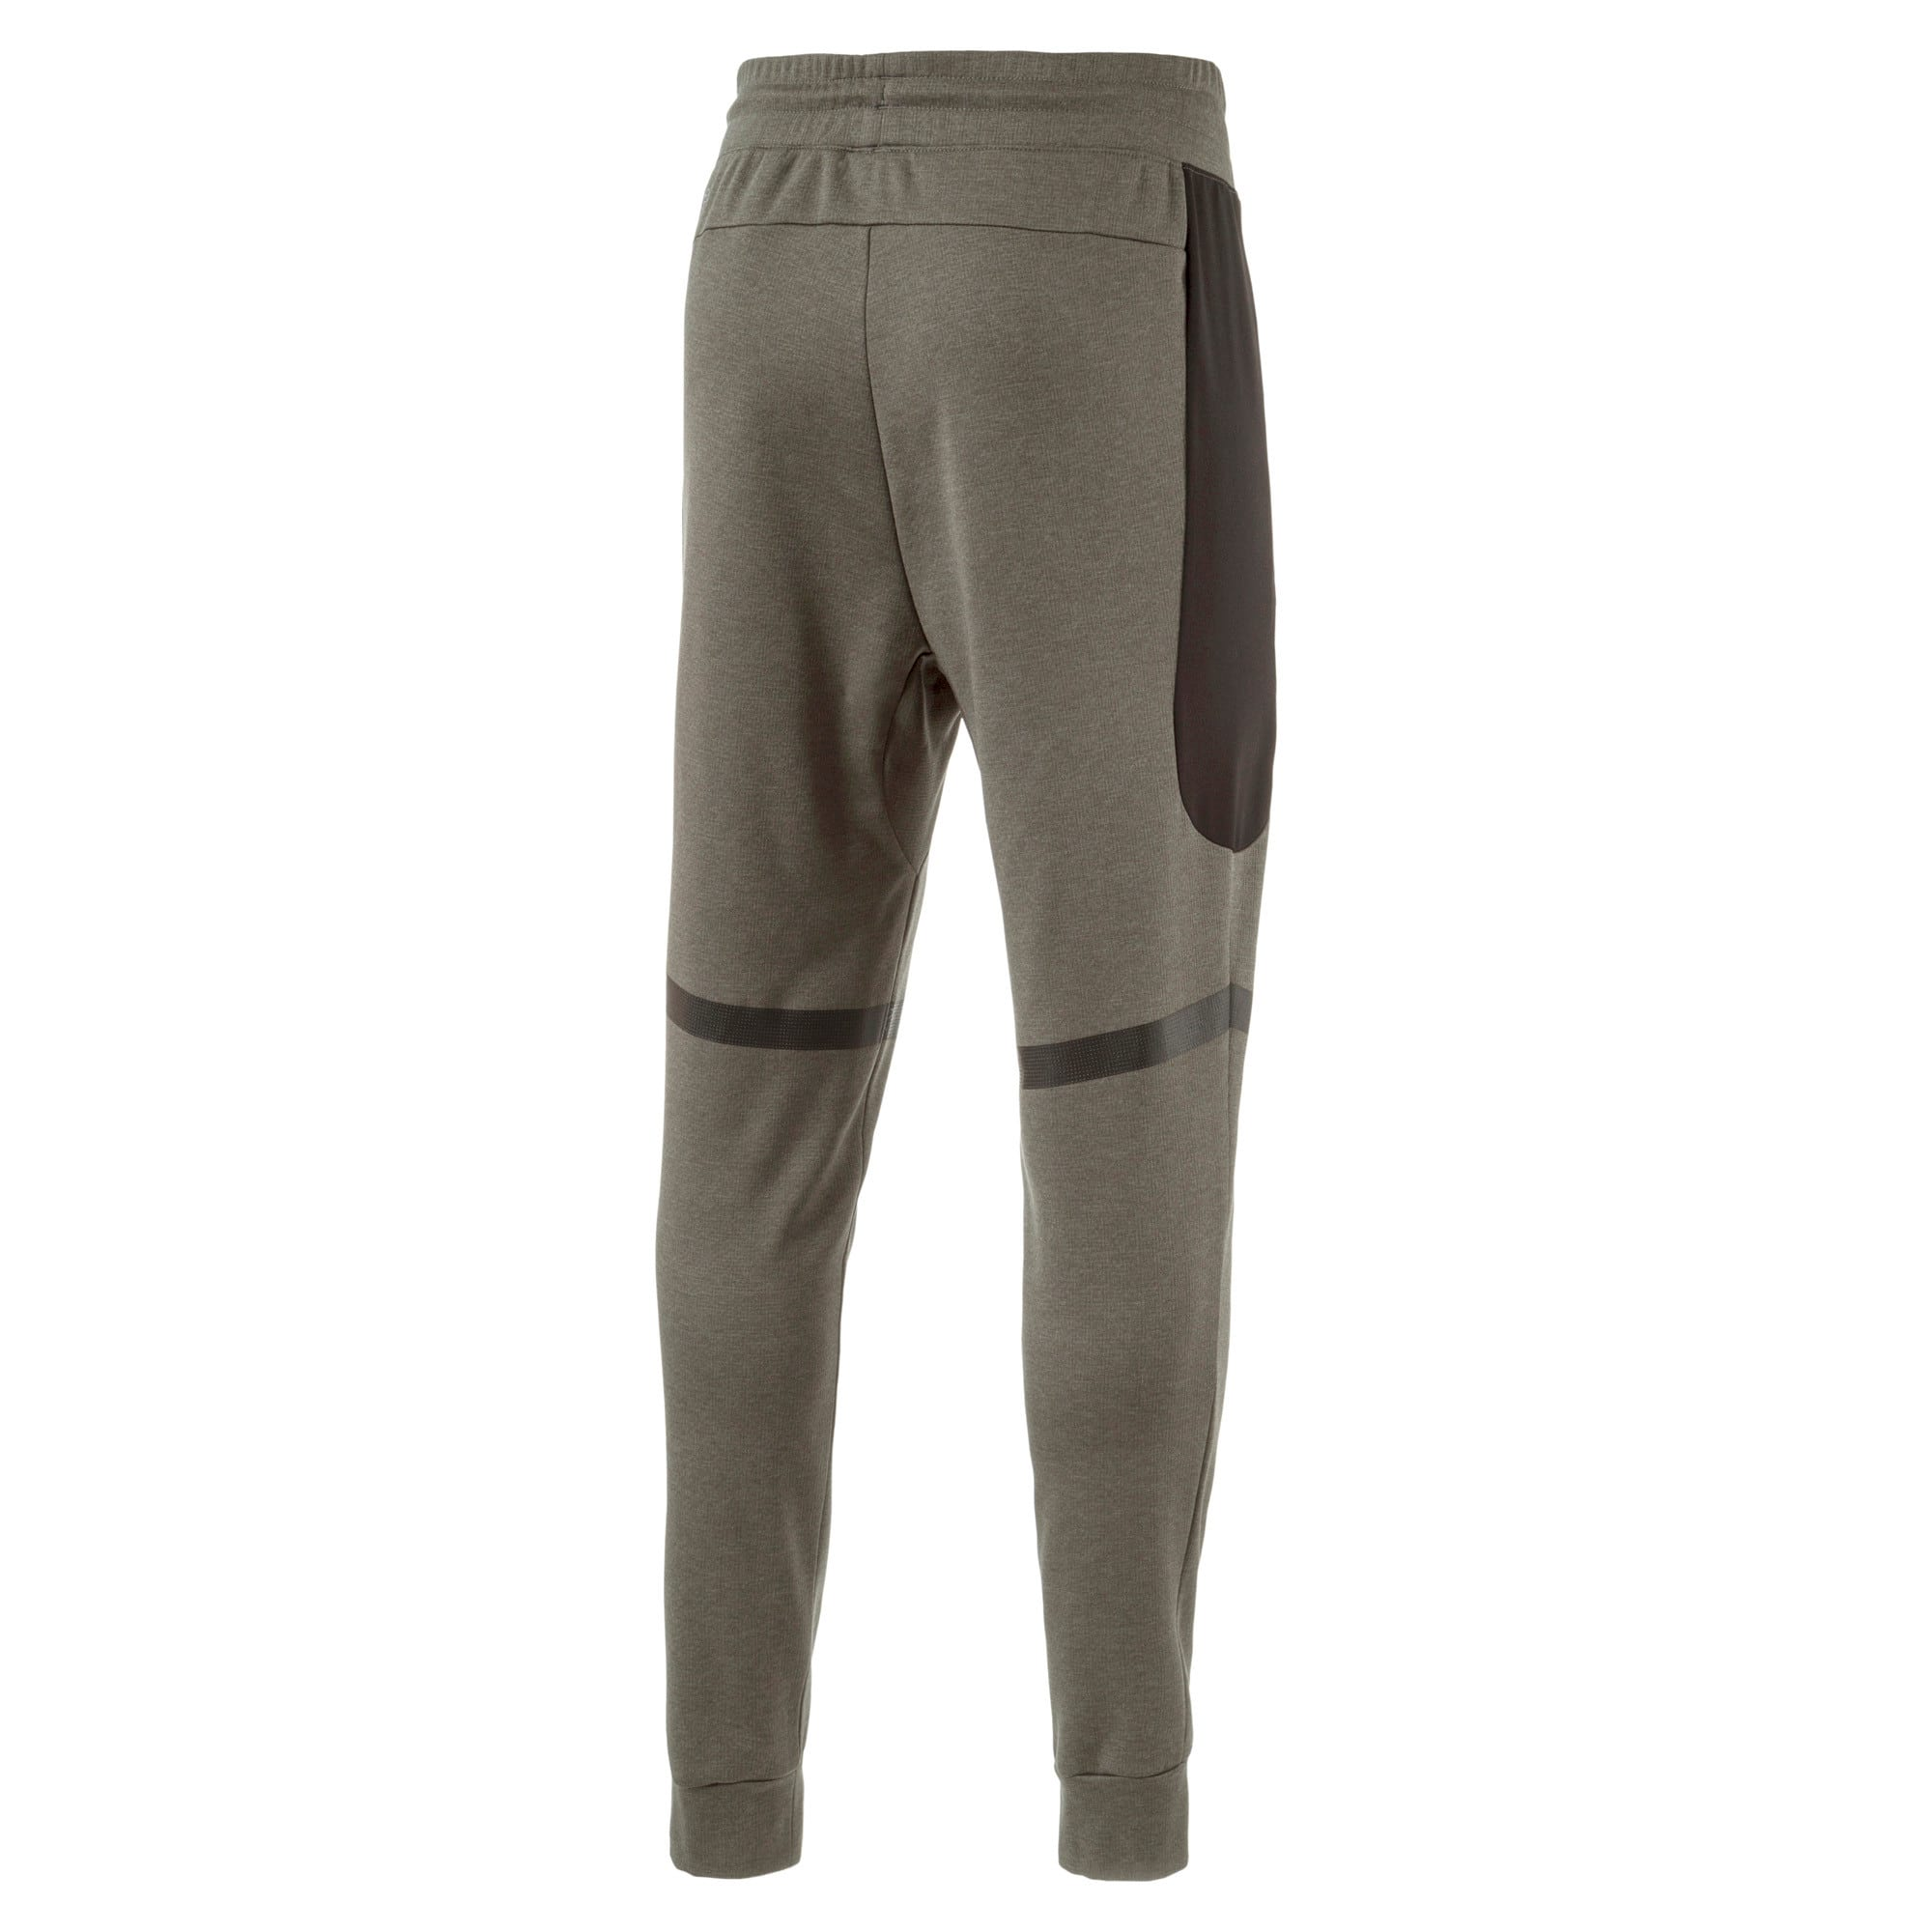 Thumbnail 2 of Trackster Men's Tech Sweatpants, Castor Gray Heather, medium-IND